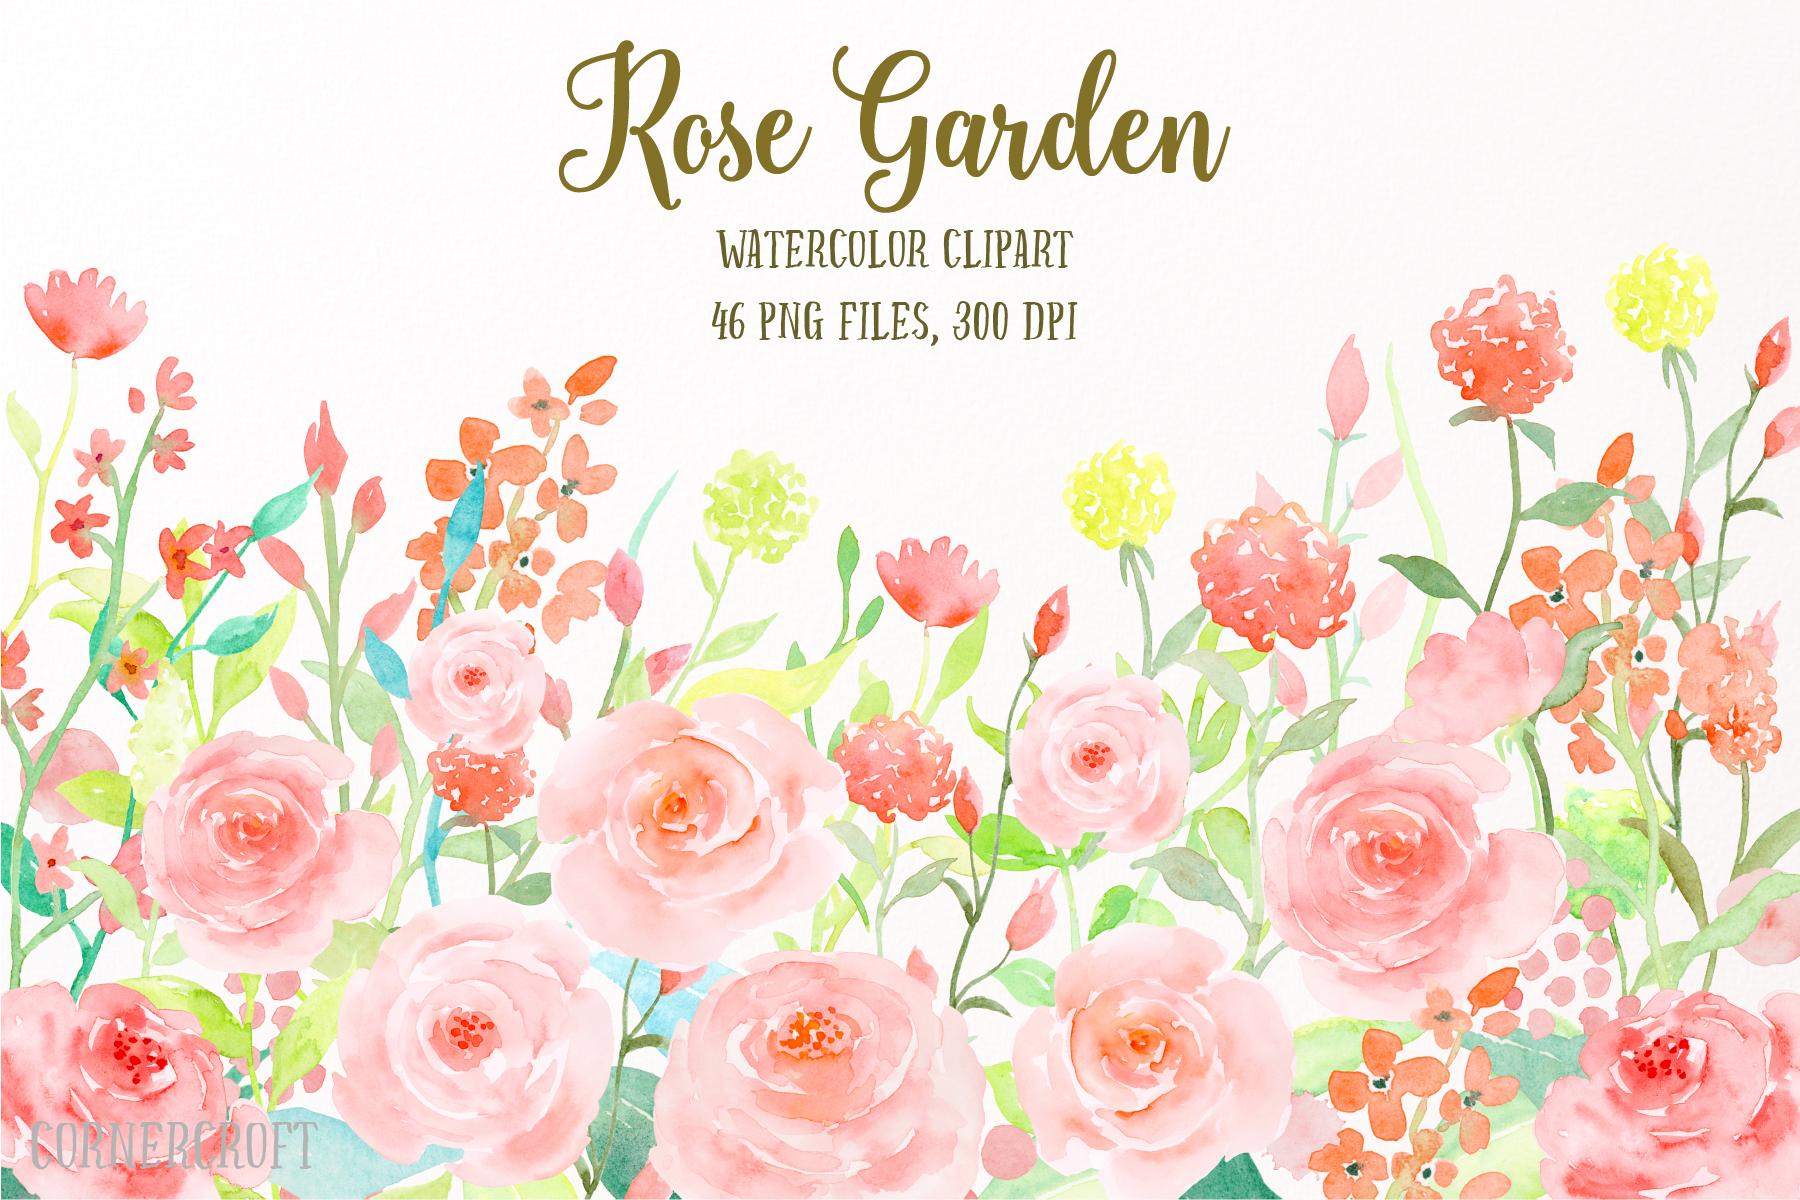 Watercolor Flower Collection Rose Garden, Watercolor Clipart.